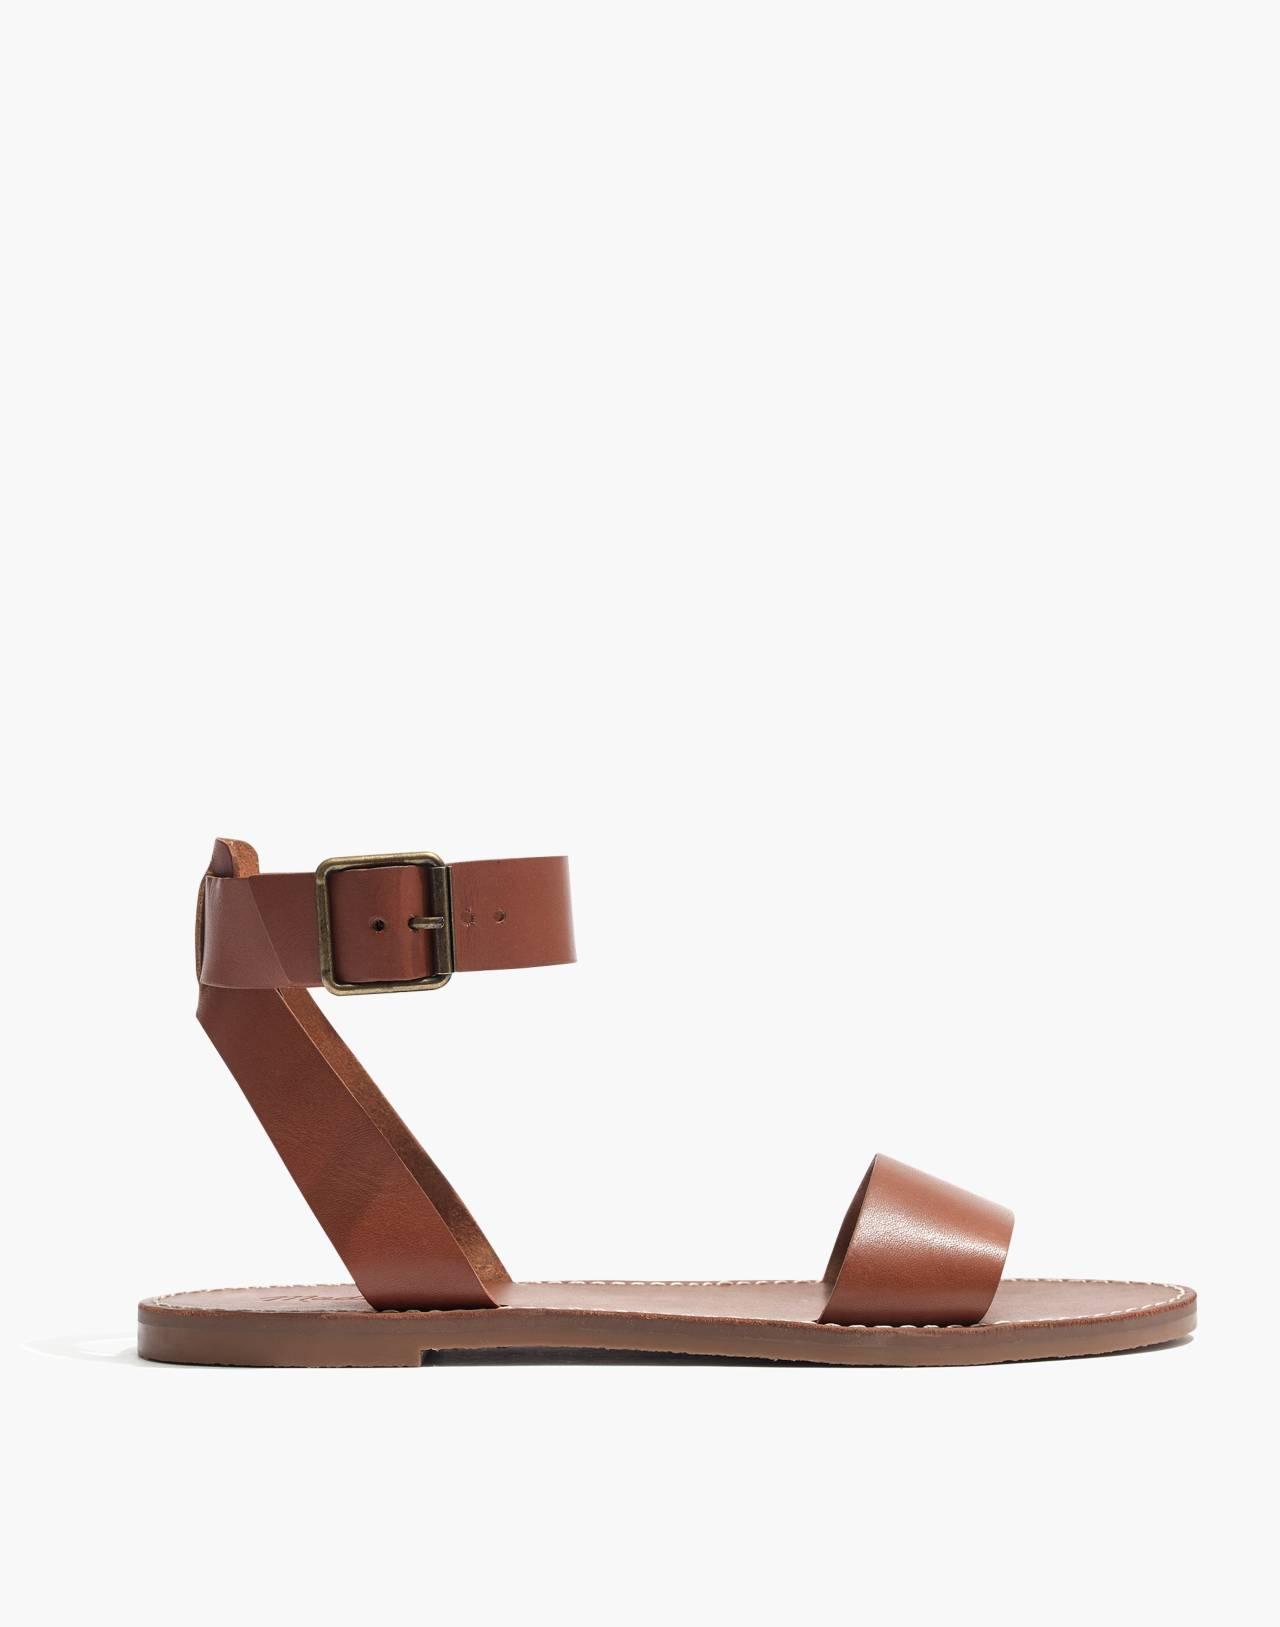 The Boardwalk Ankle-Strap Sandal in english saddle image 3